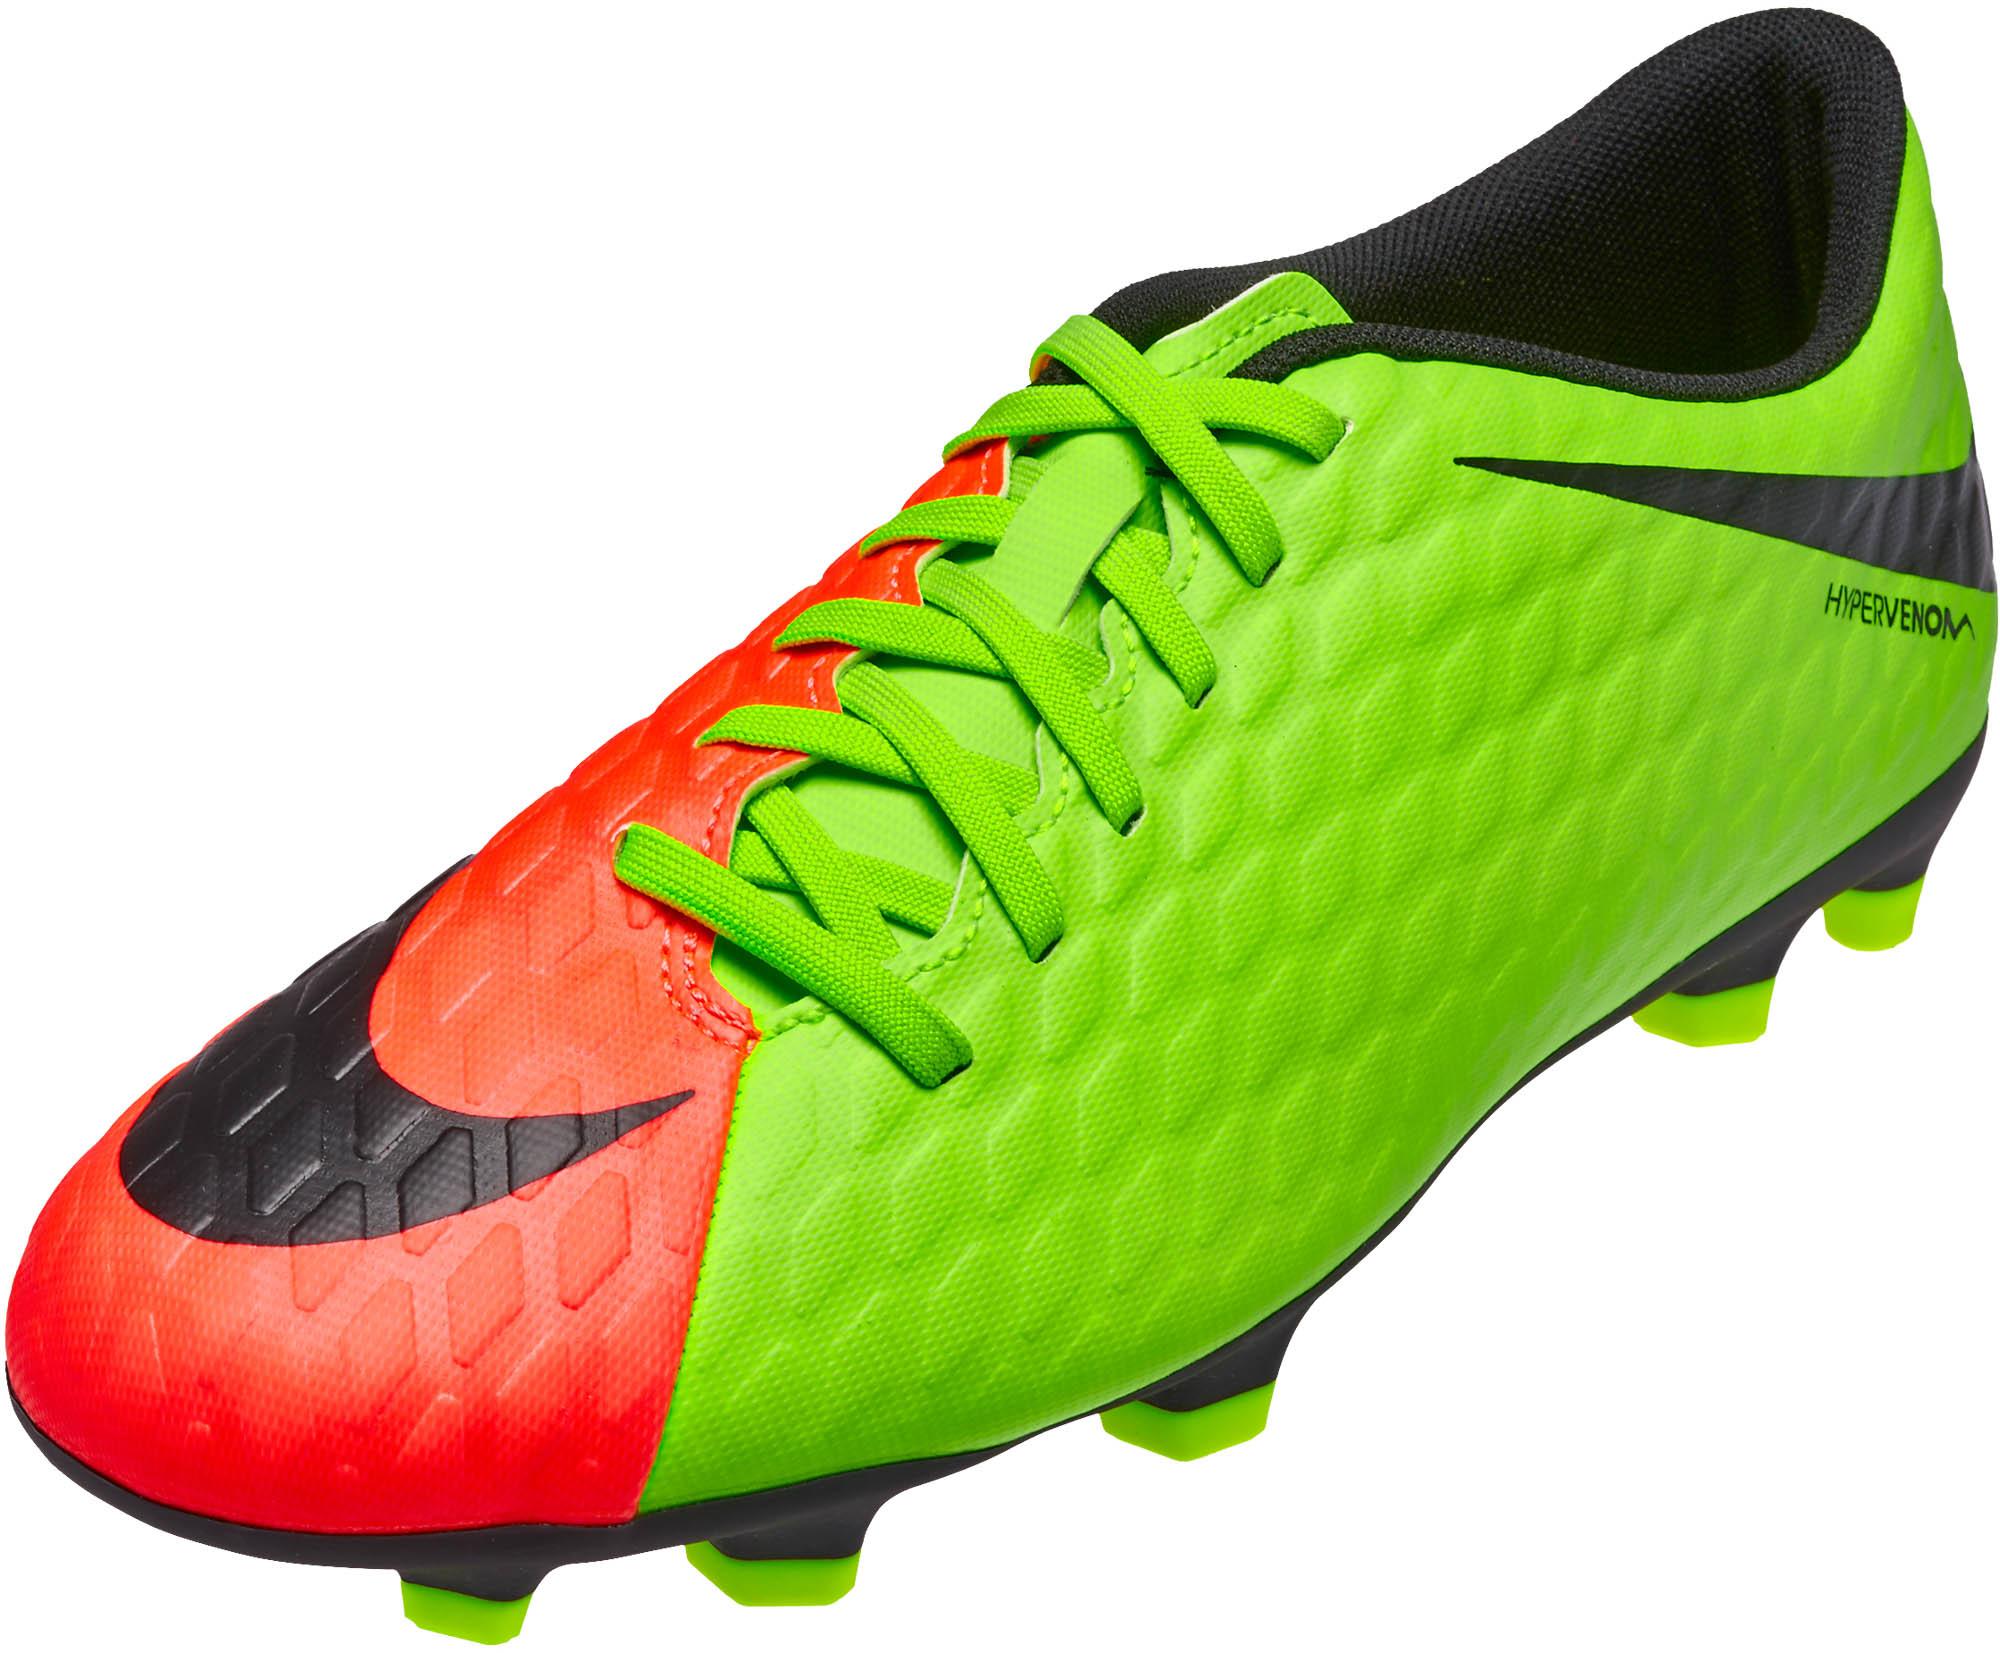 super popular 42785 c3003 Nike Hypervenom Phade III FG Soccer Cleats - Electric Green ...